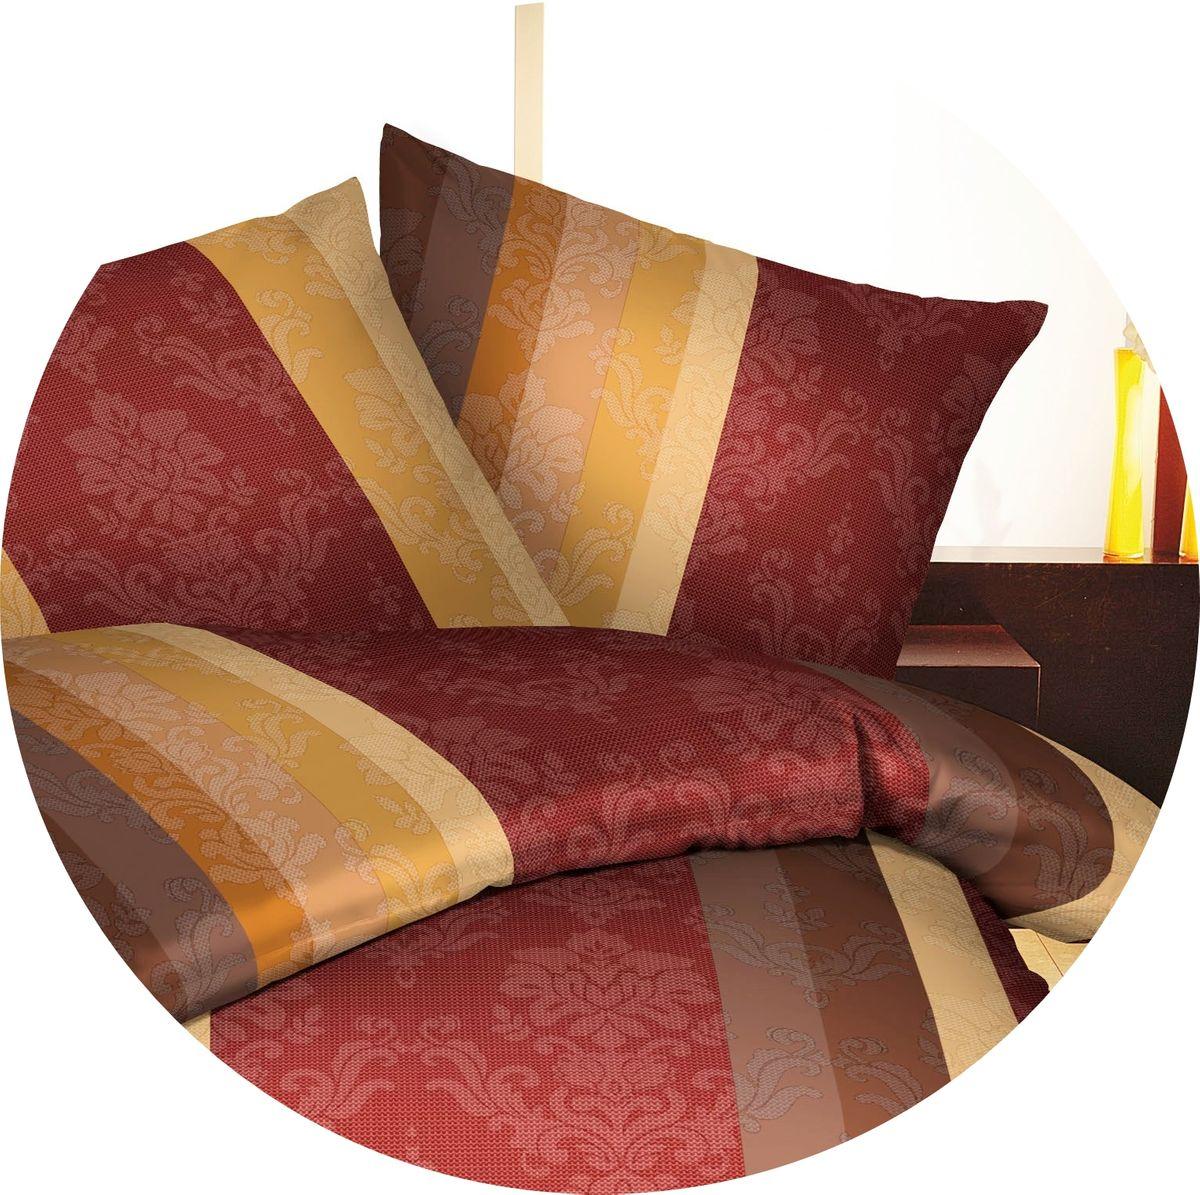 ganzj hrige bettw sche online bestellen bettw sche jack online shop. Black Bedroom Furniture Sets. Home Design Ideas